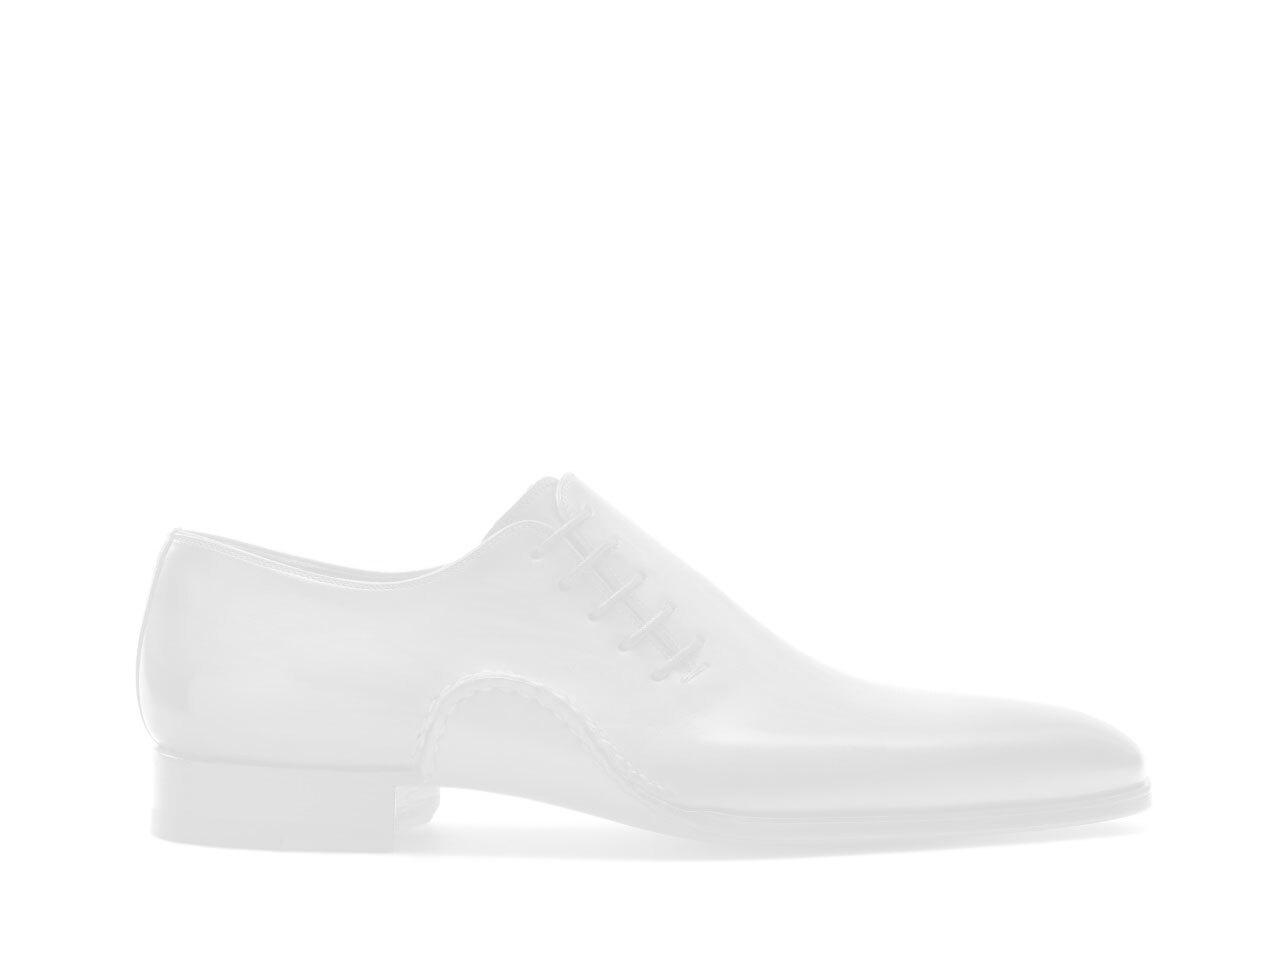 Burgundy shell cordovan tassel loafer shoes for men - Magnanni